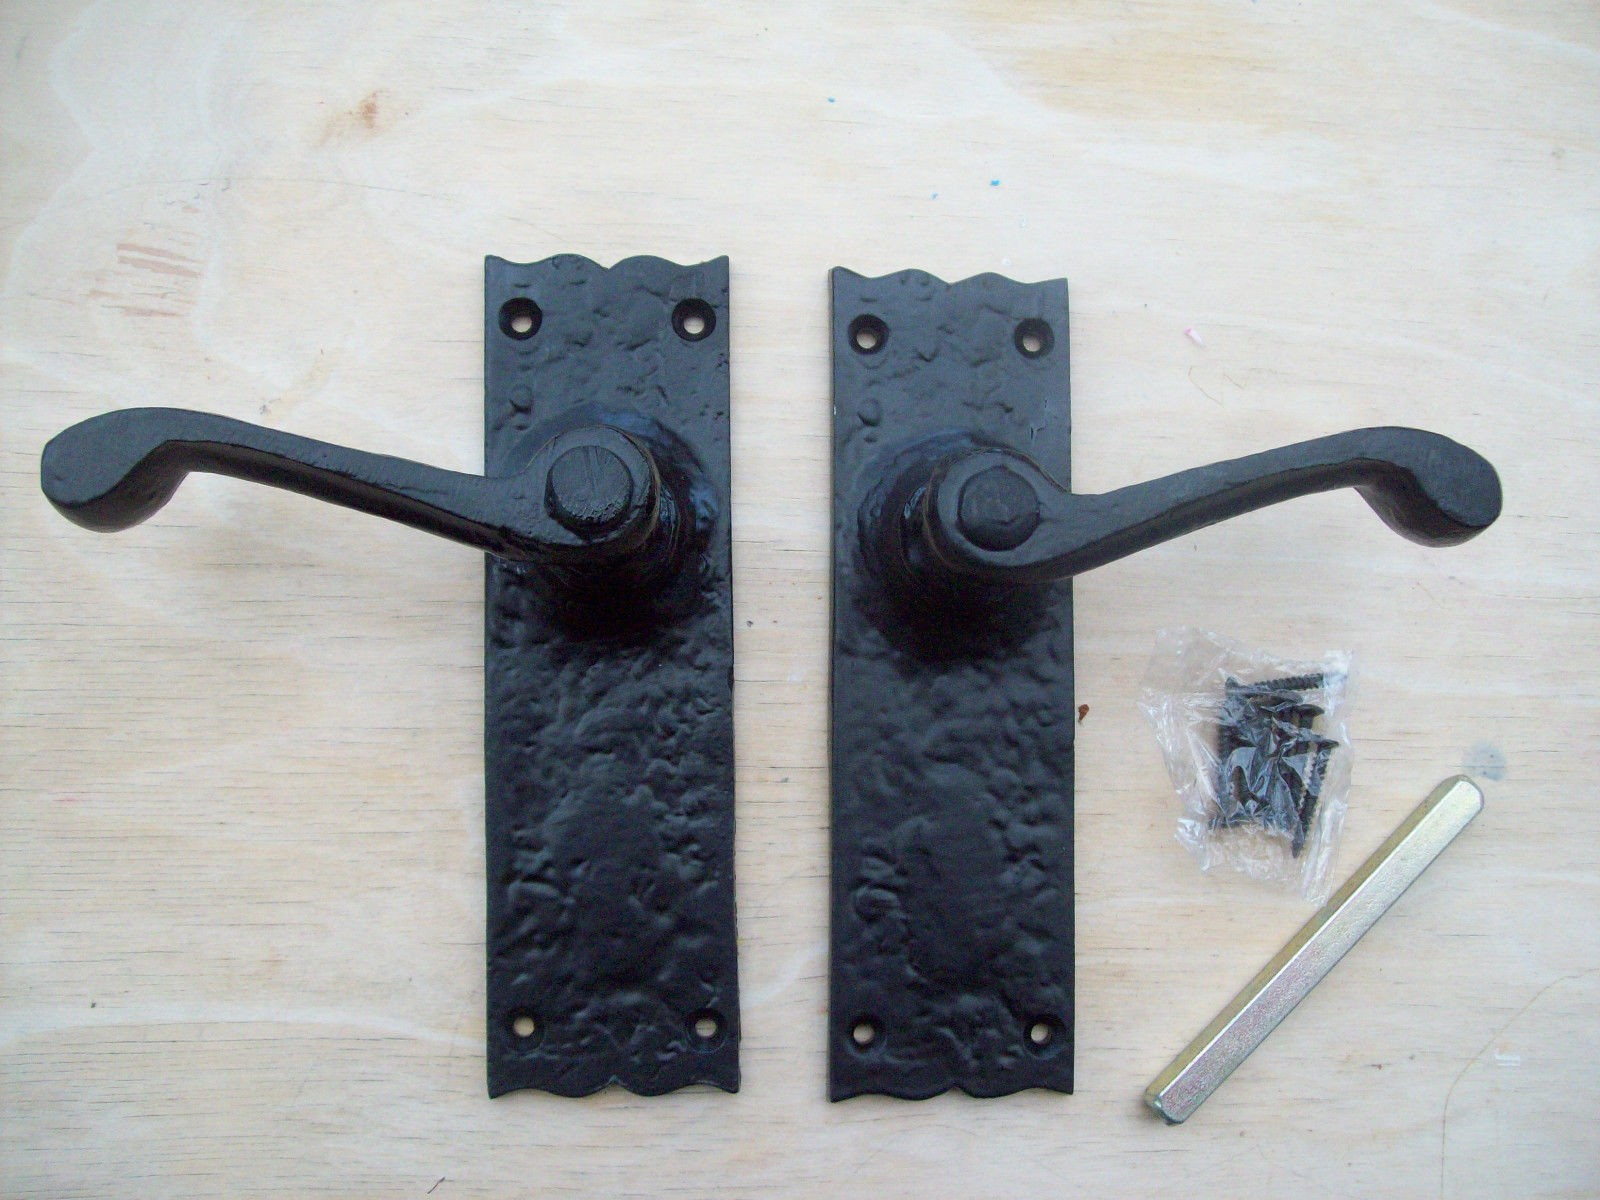 kitchen sliding shelves aprons black antique style door handles | ironmongery world